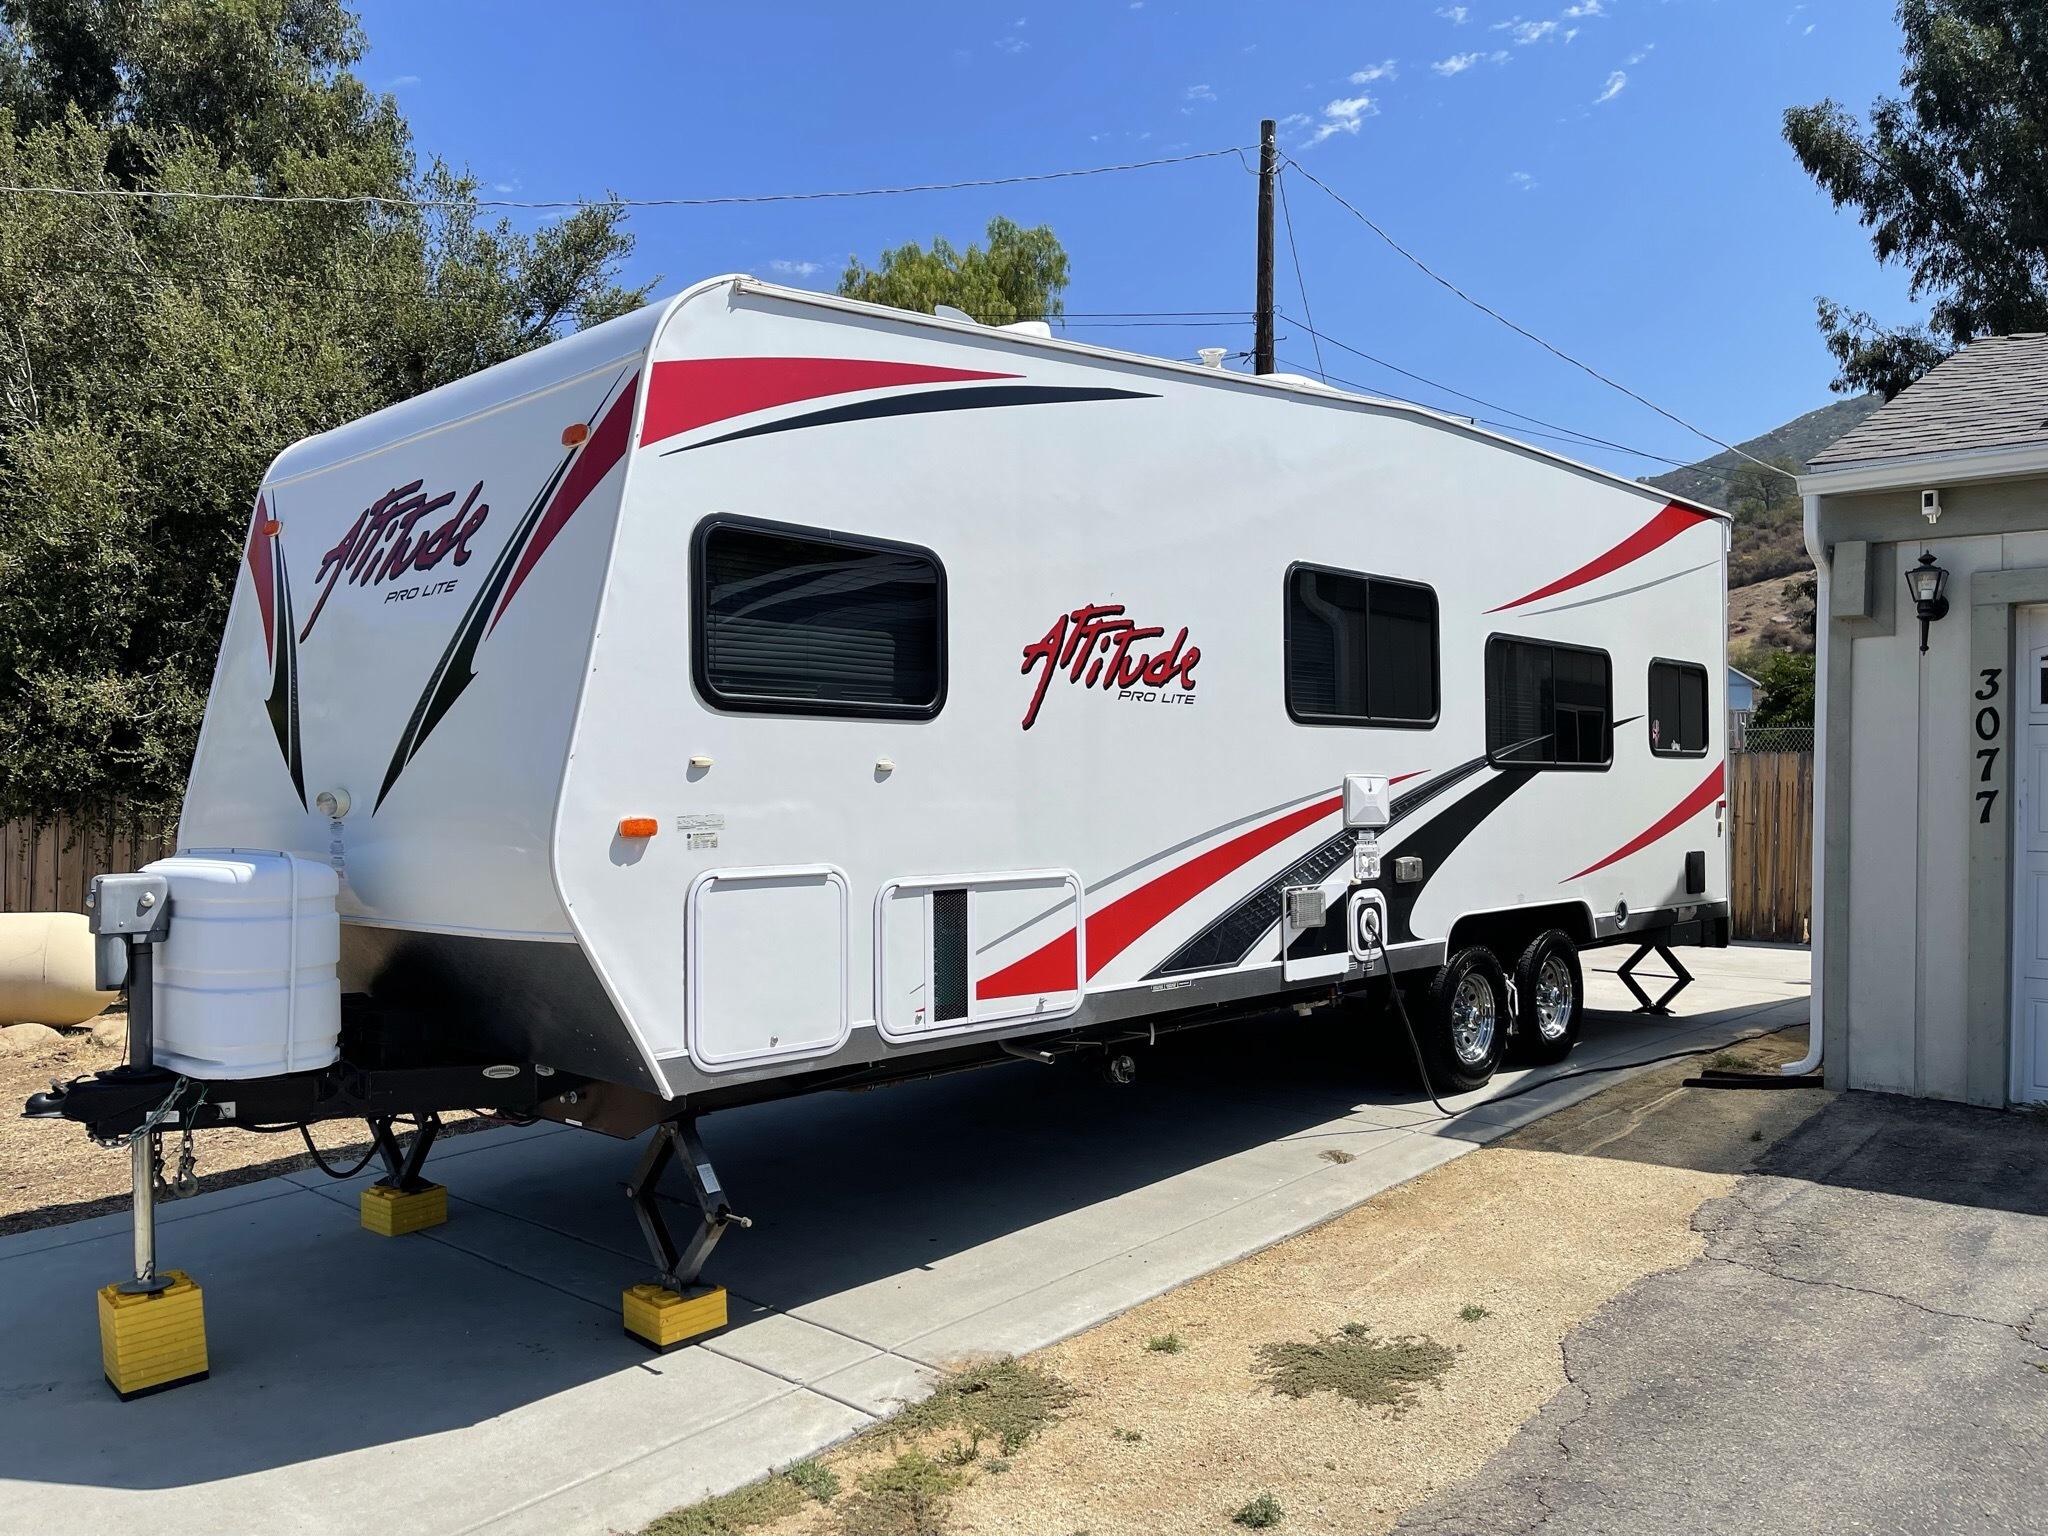 Photo Used 2012 Eclipse Recreational Vehicles Travel Trailer Toy Hauler RV  $21500